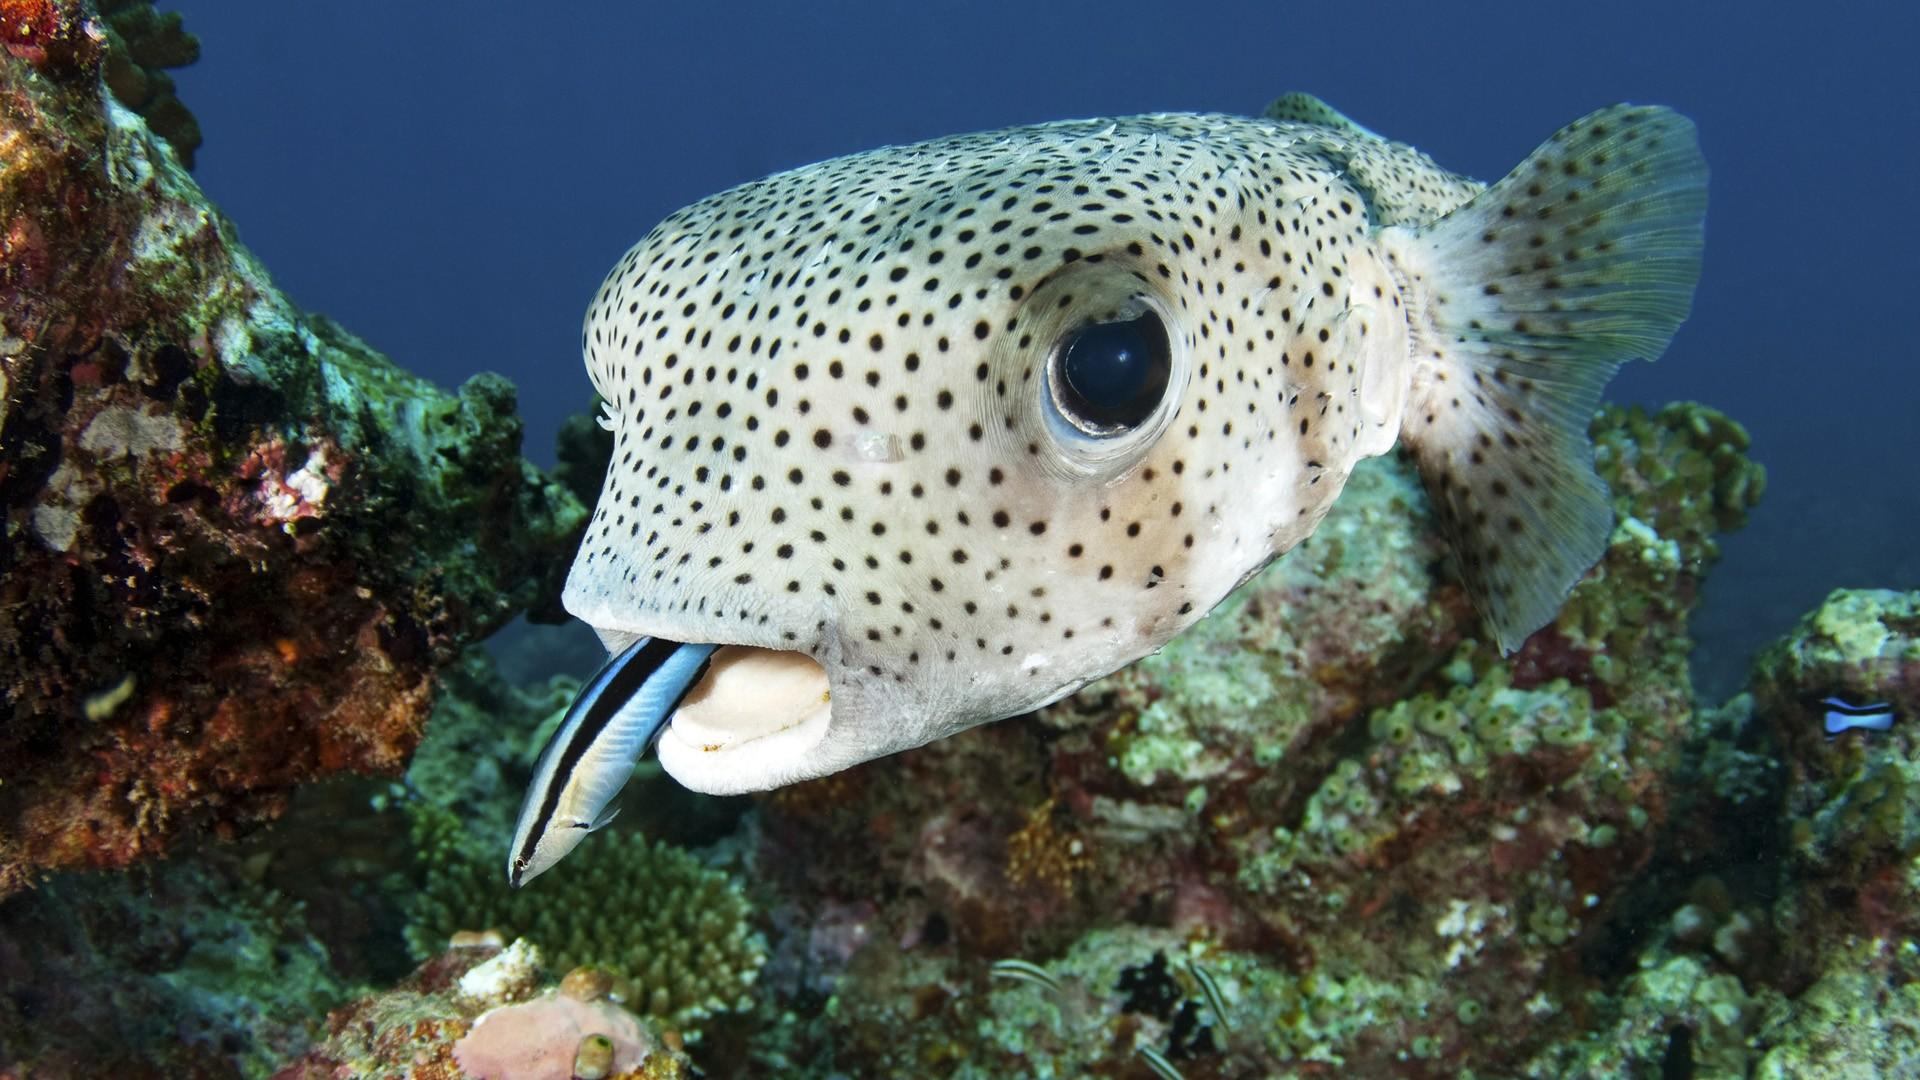 cute fish wallpaper - photo #19